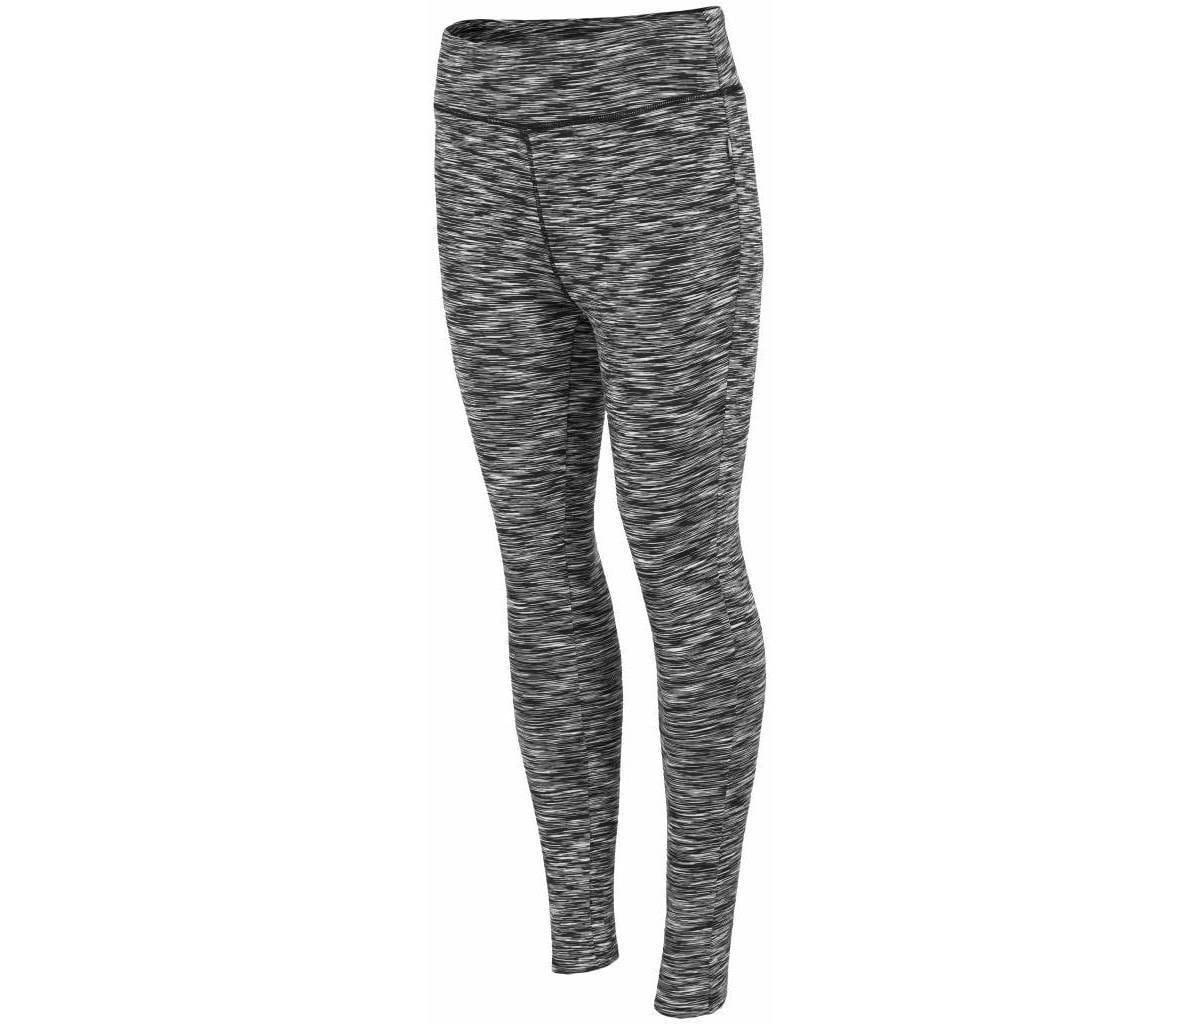 Kalhoty 4F Leggings LEG003